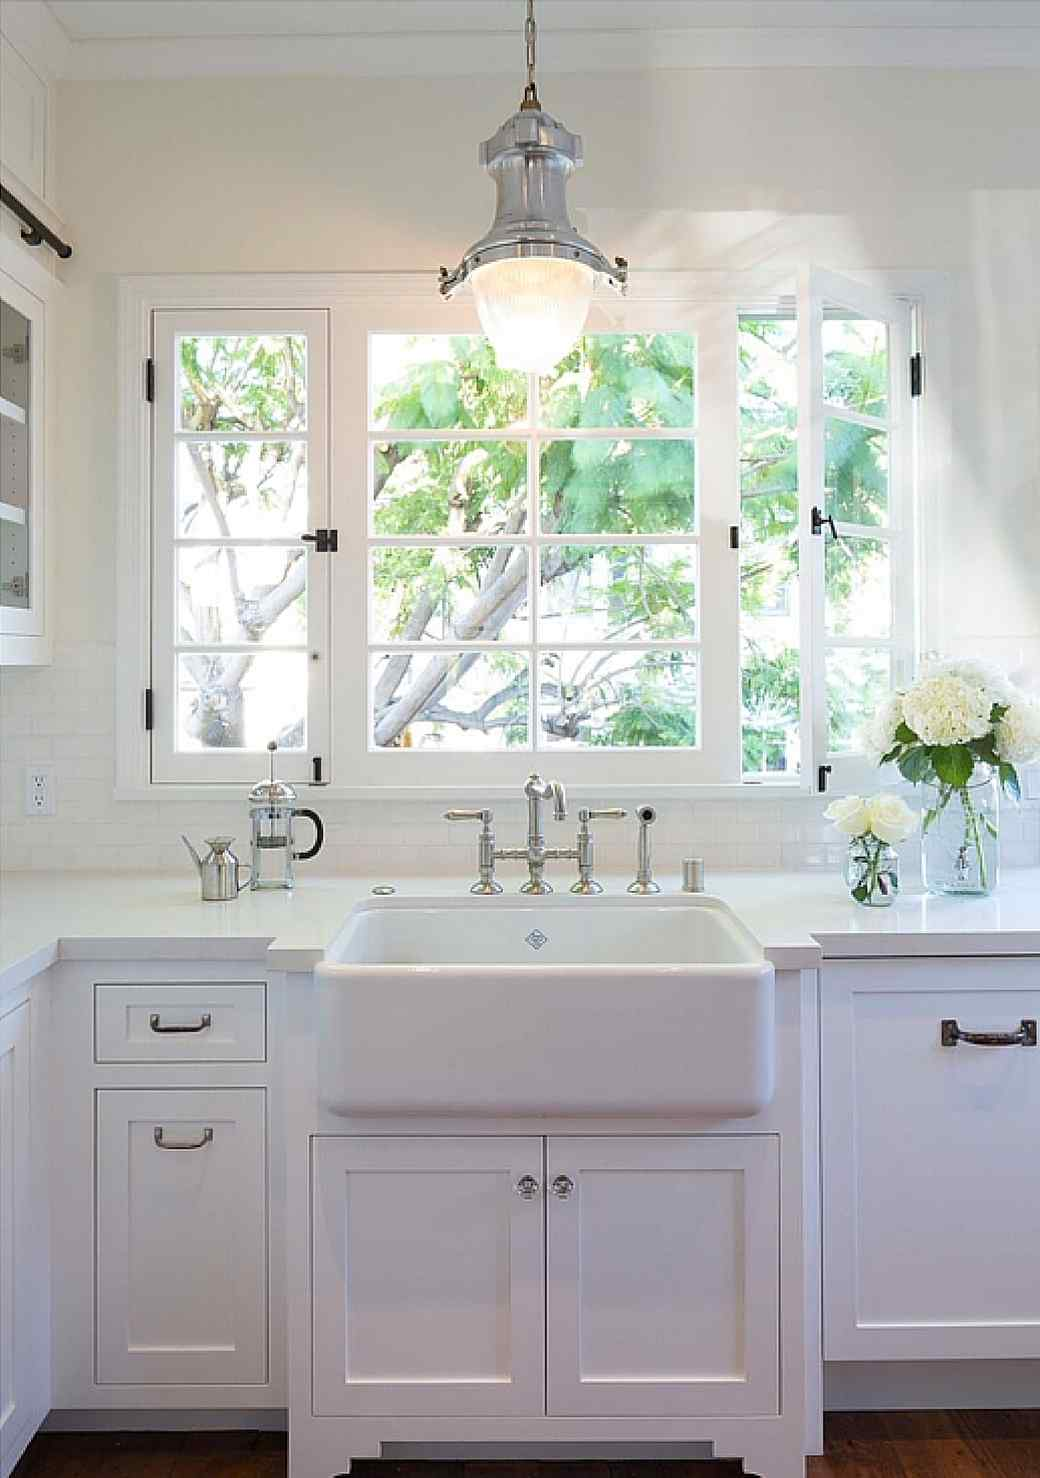 3 Amazing Kitchen Remodel Ideas That Inspire